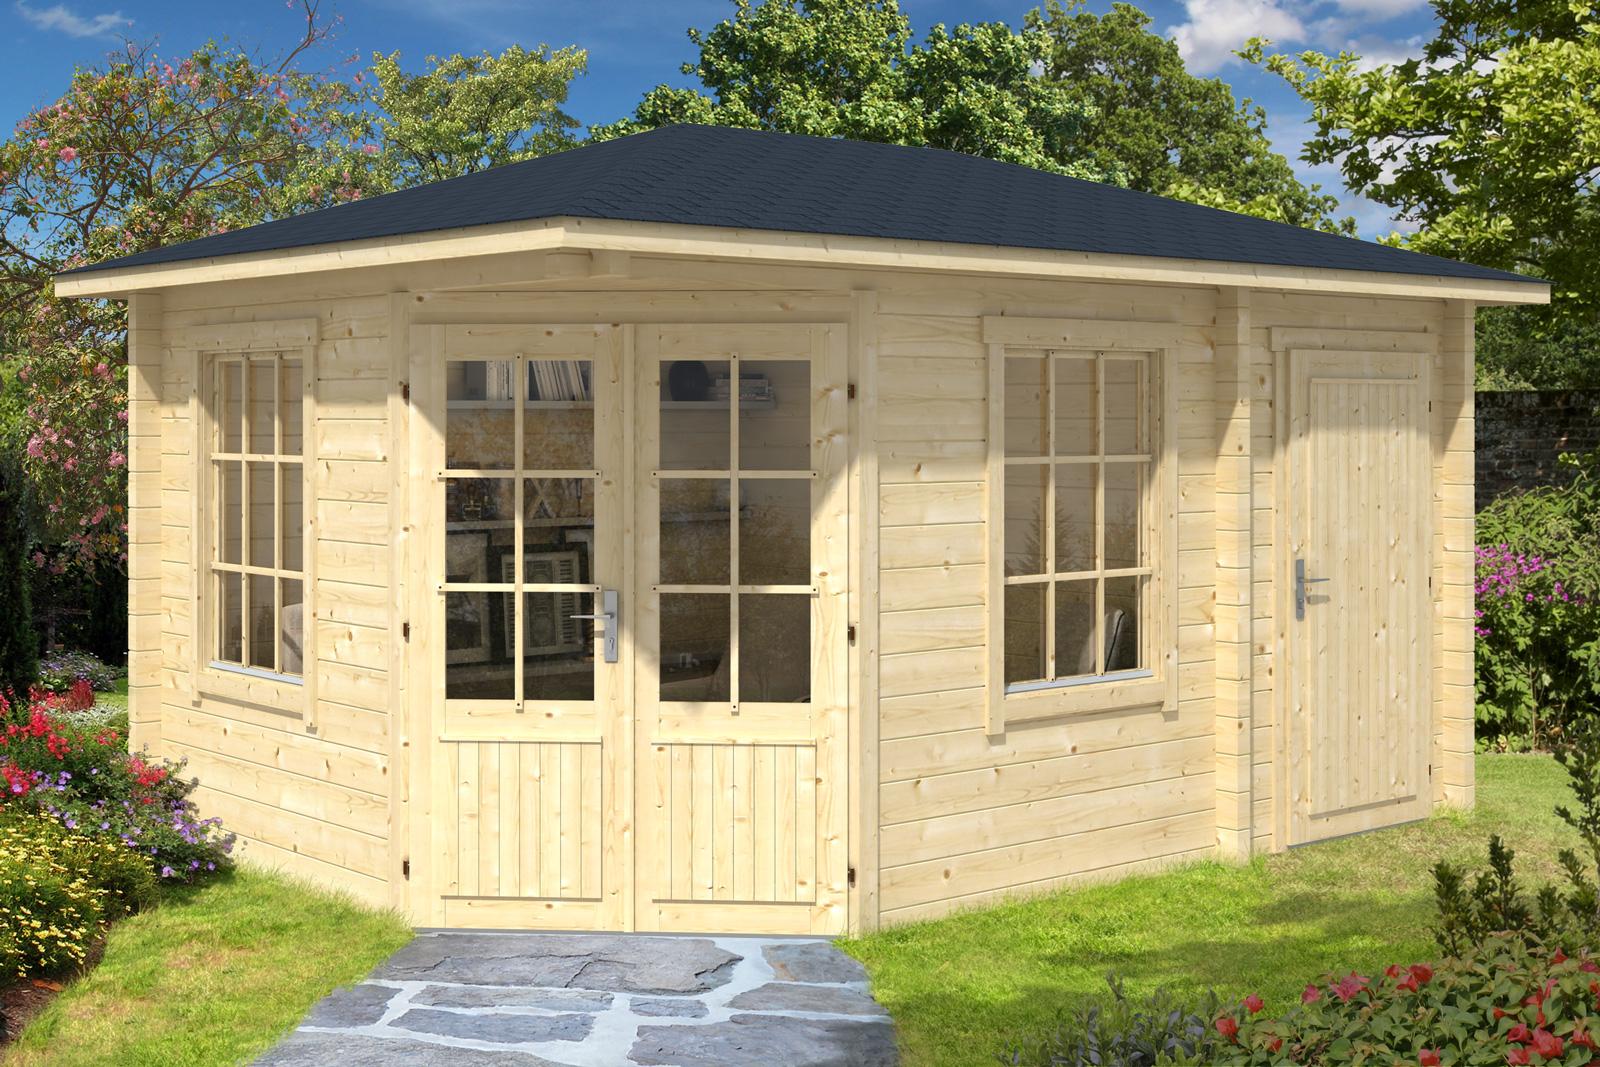 5 eck gartenhaus modell rhein 70. Black Bedroom Furniture Sets. Home Design Ideas